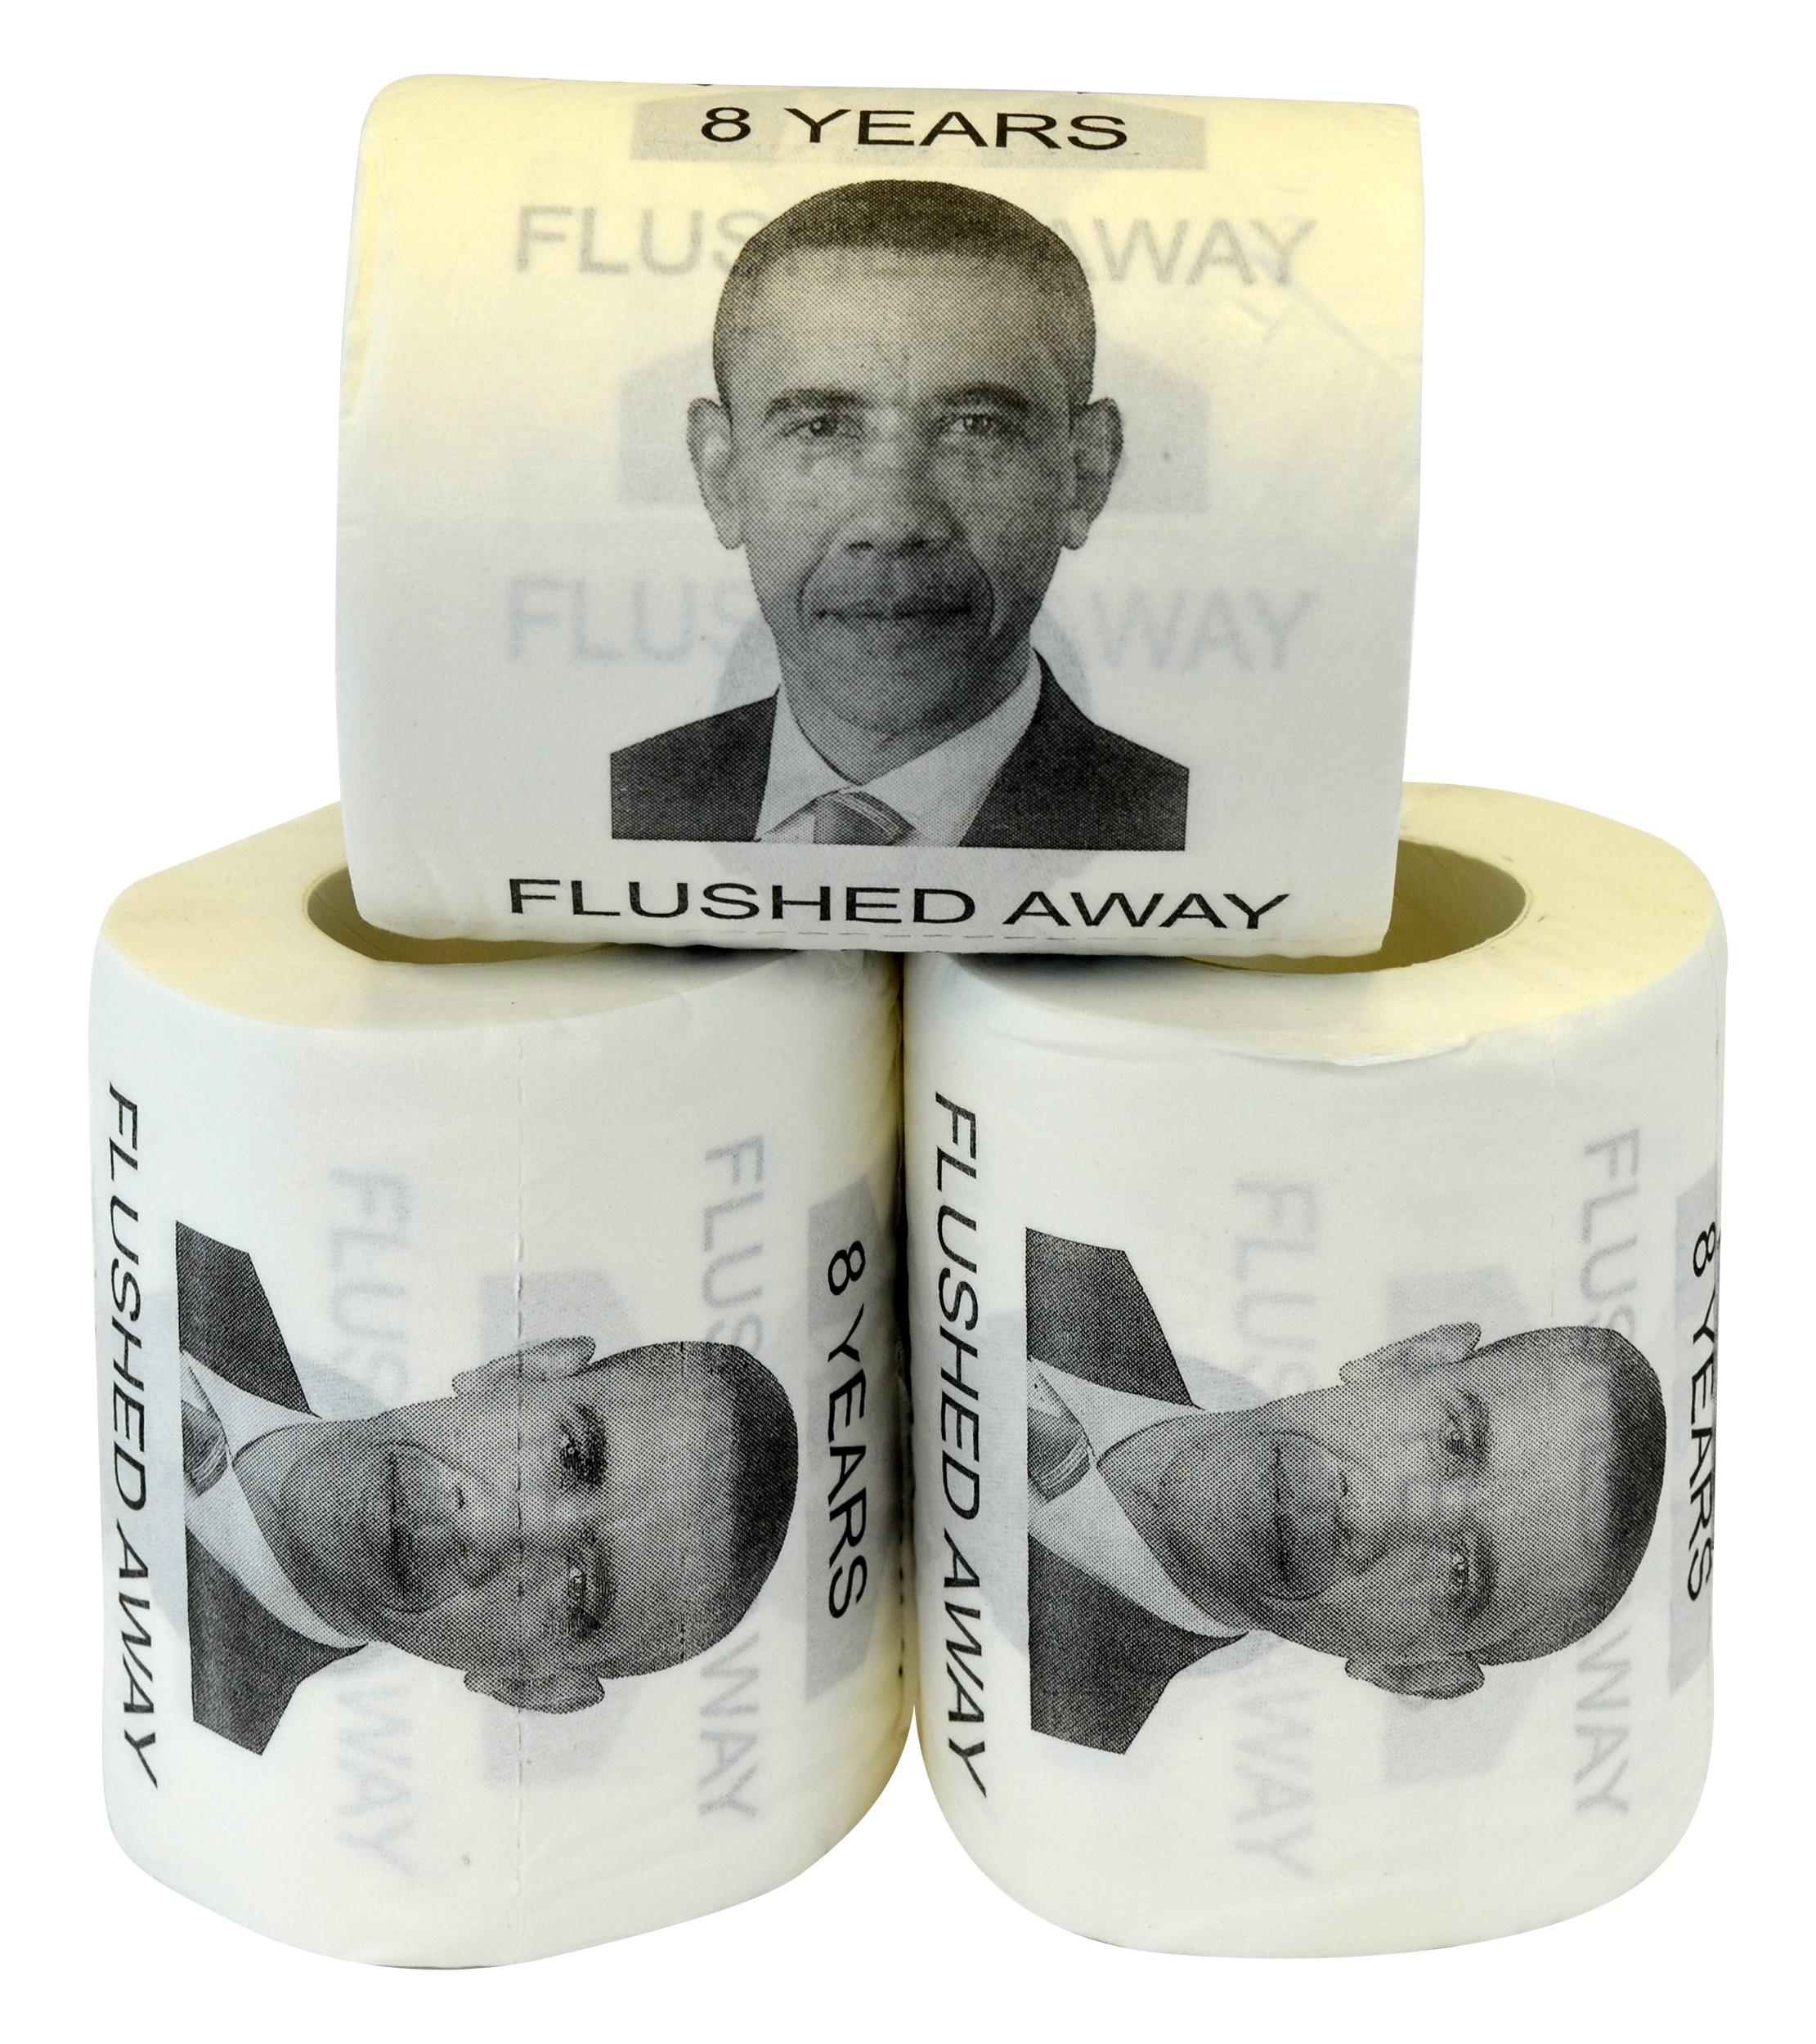 Barack Obama 8 Years Flushed Away Novelty Toilet Paper, 3-Pack